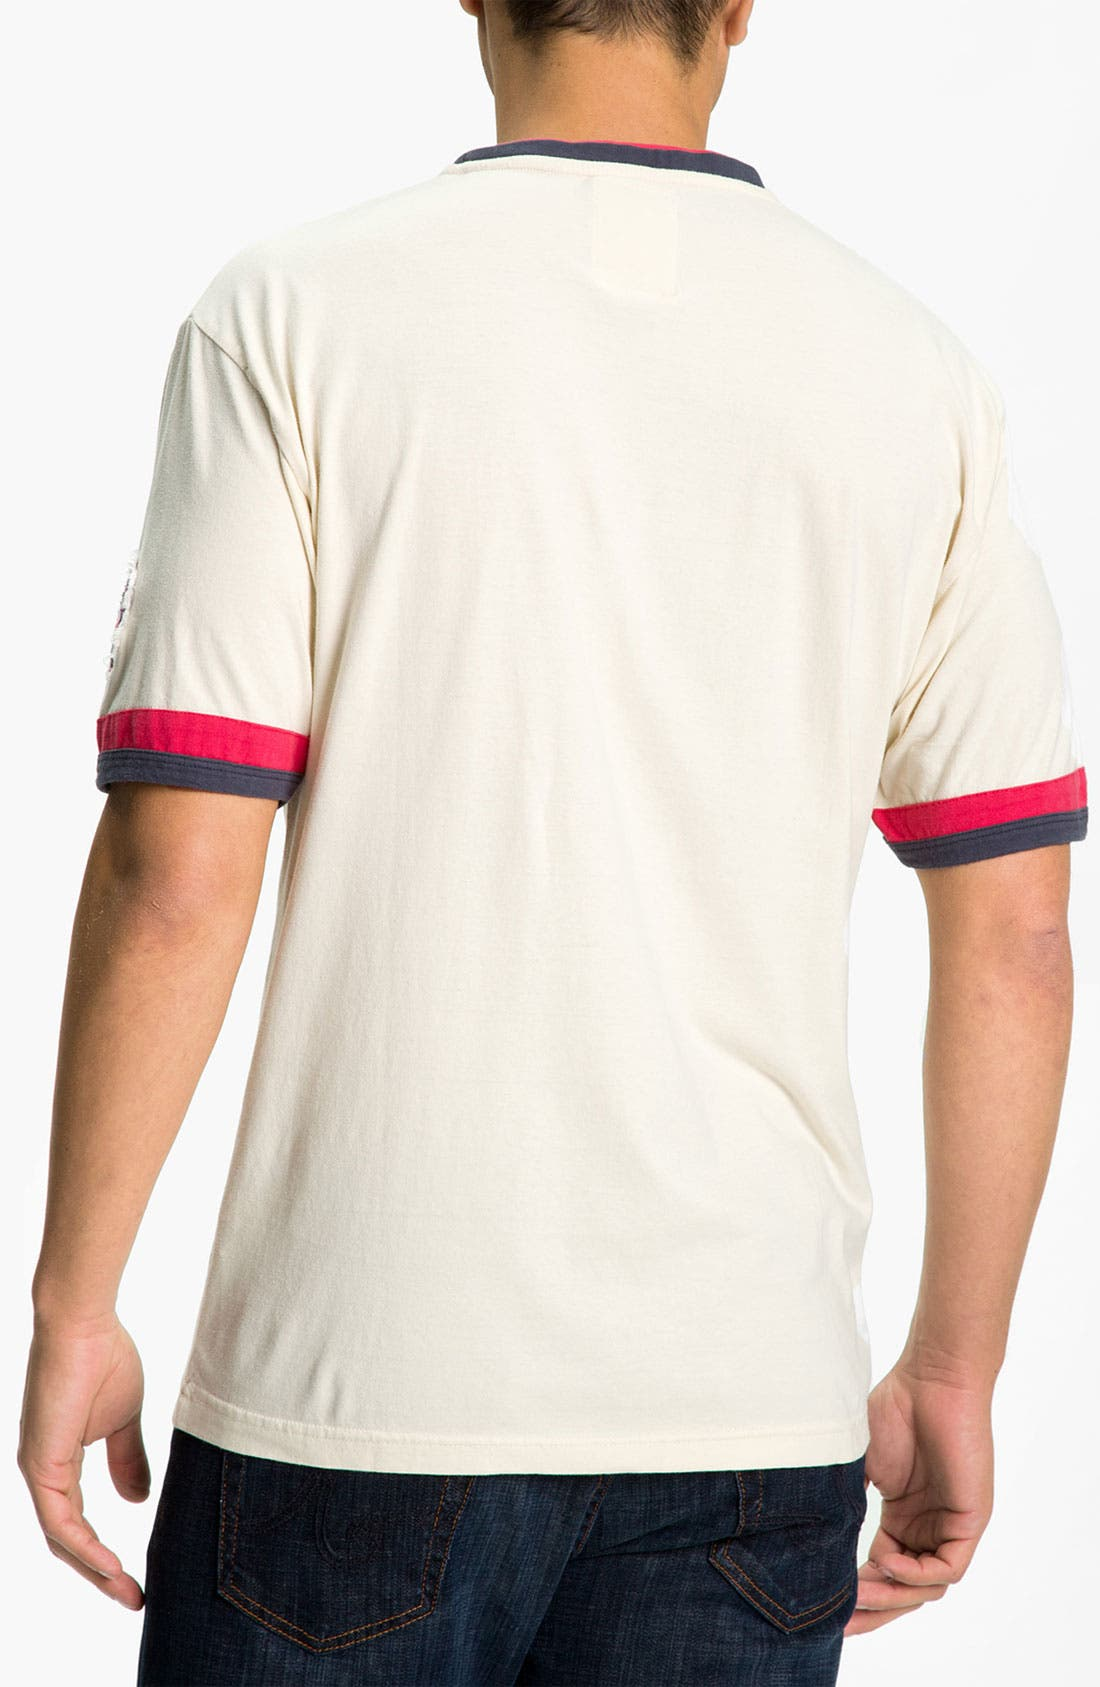 Alternate Image 2  - Red Jacket 'Minnesota Twins' Trim Fit Crewneck Ringer T-Shirt (Men)